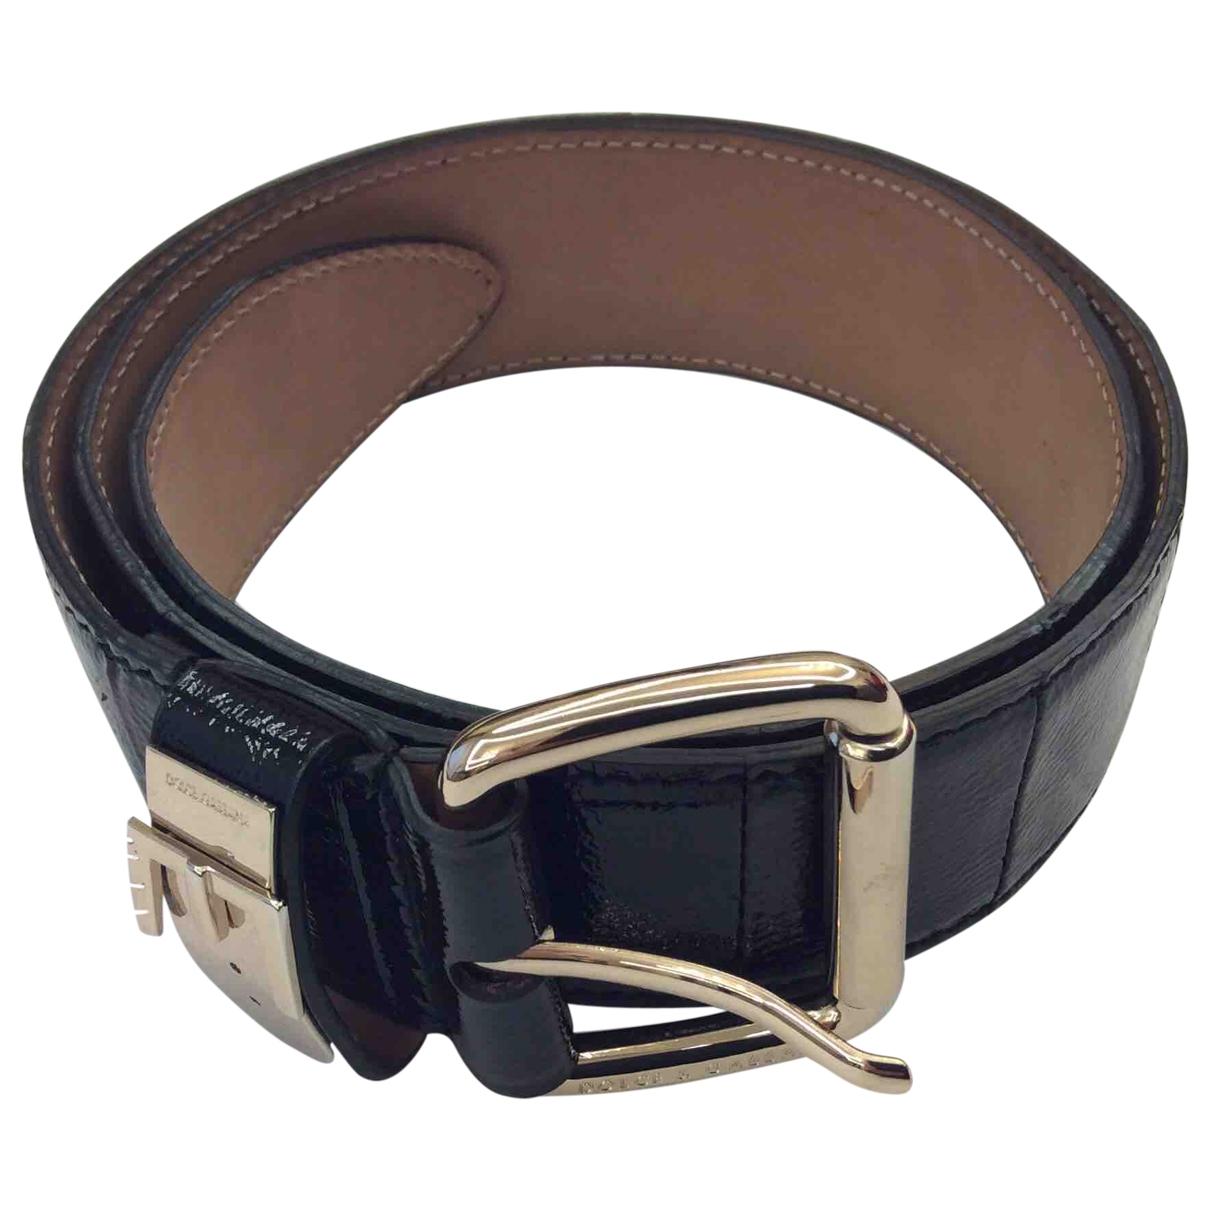 Dolce & Gabbana \N Black Patent leather belt for Women L International